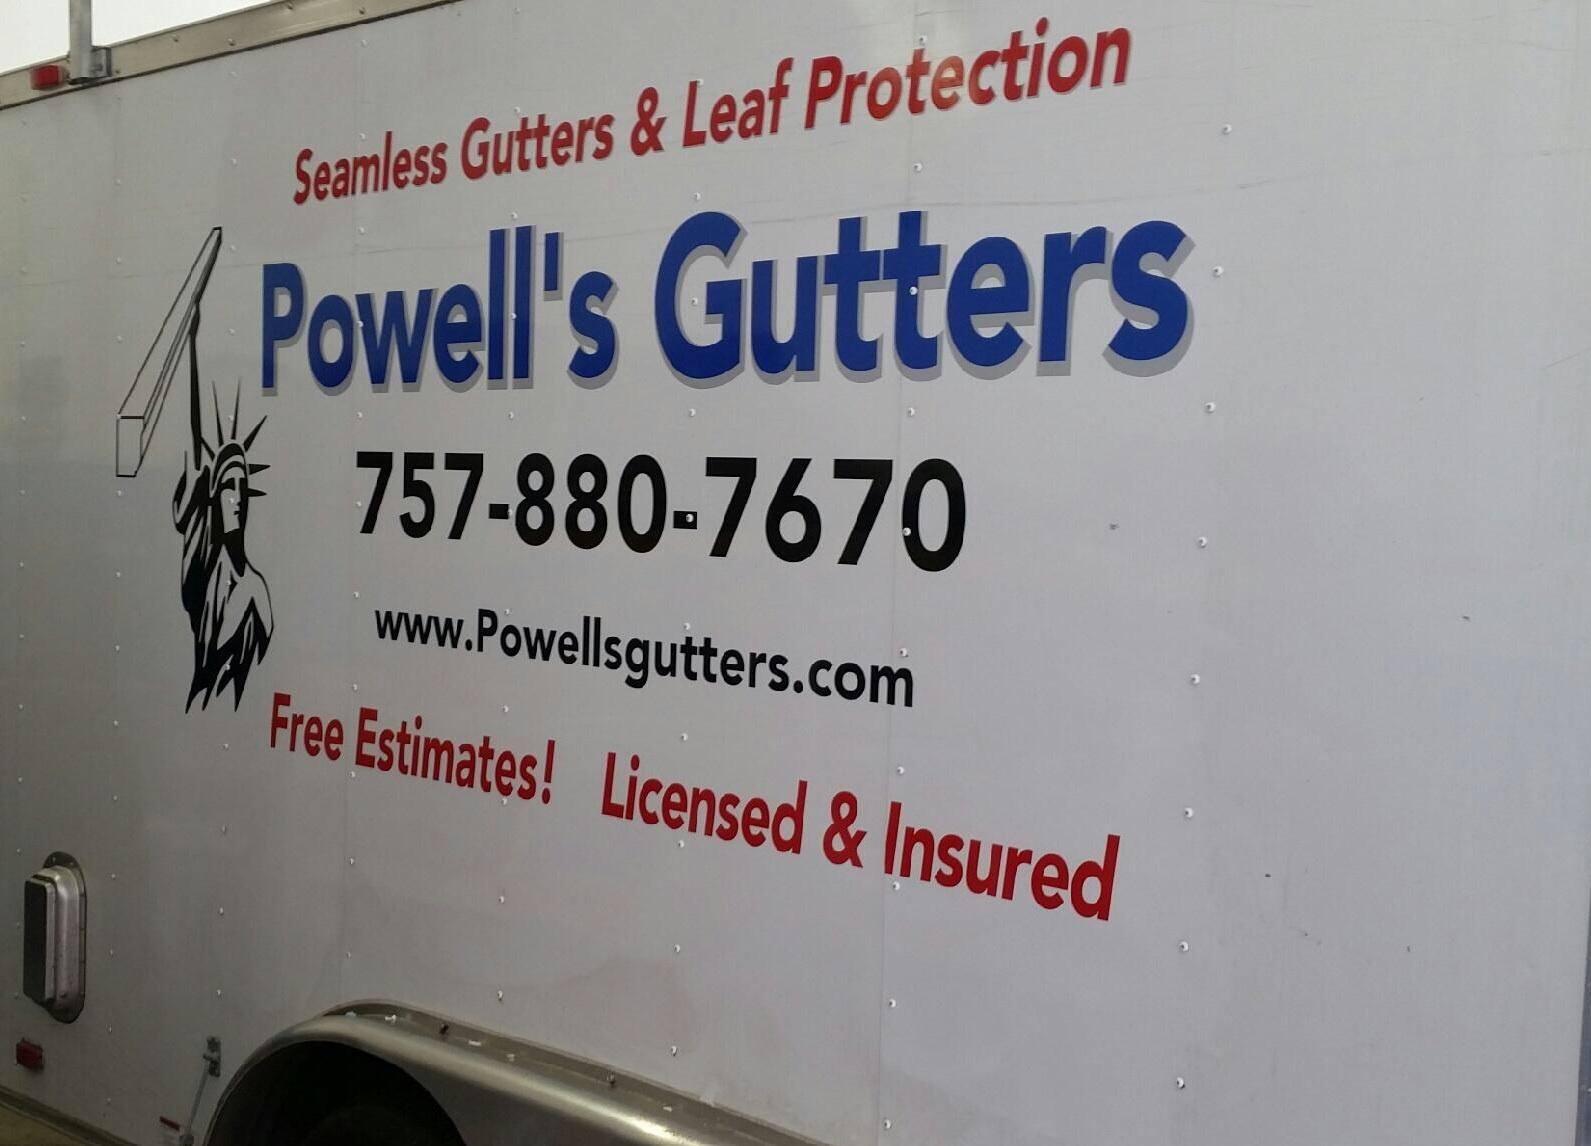 Powell's Seamless Gutters